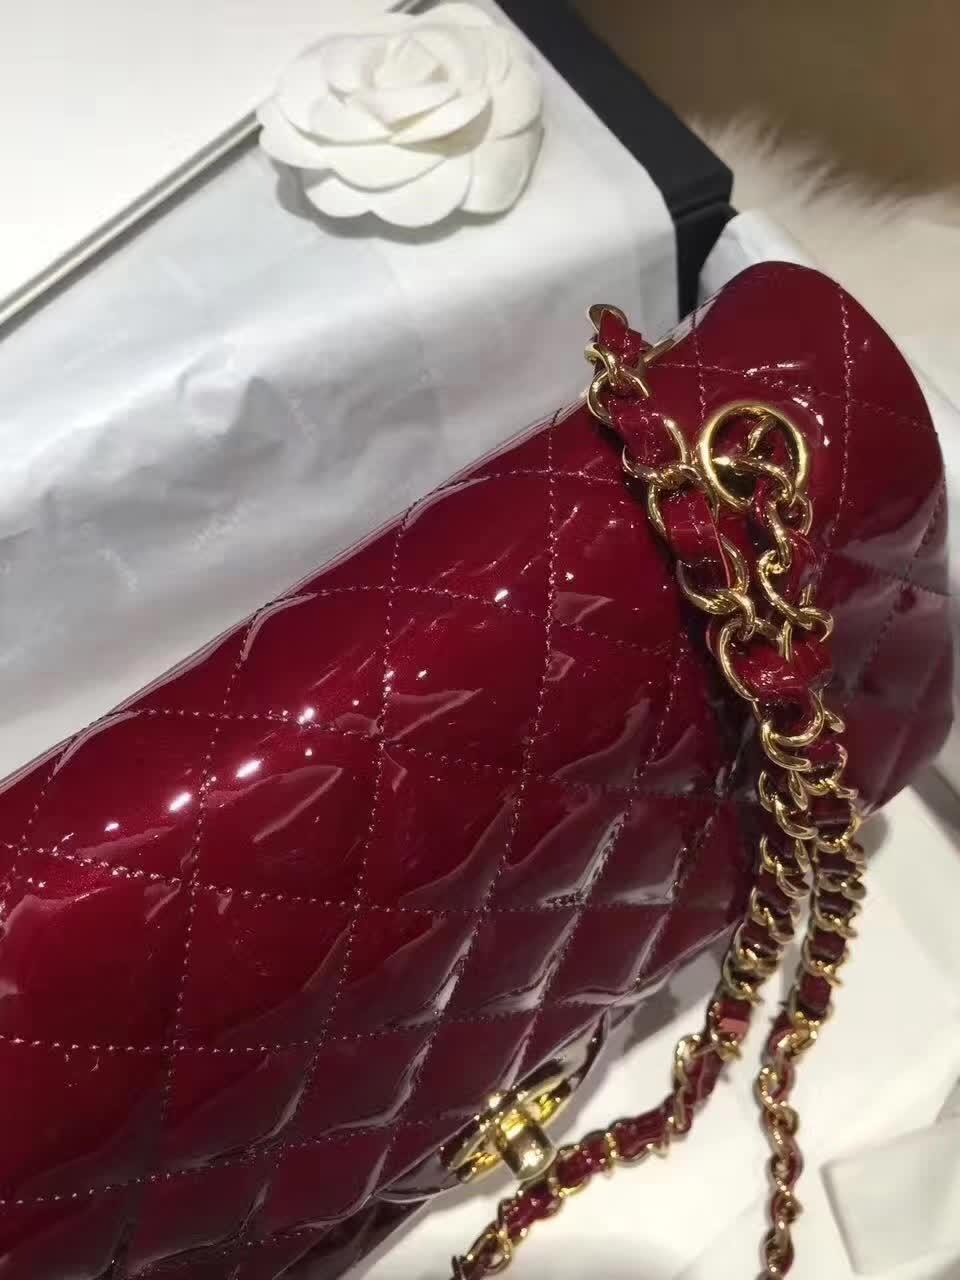 Chanel 香奈儿 Classic Flap 漆皮 酒红 25cm 金五金